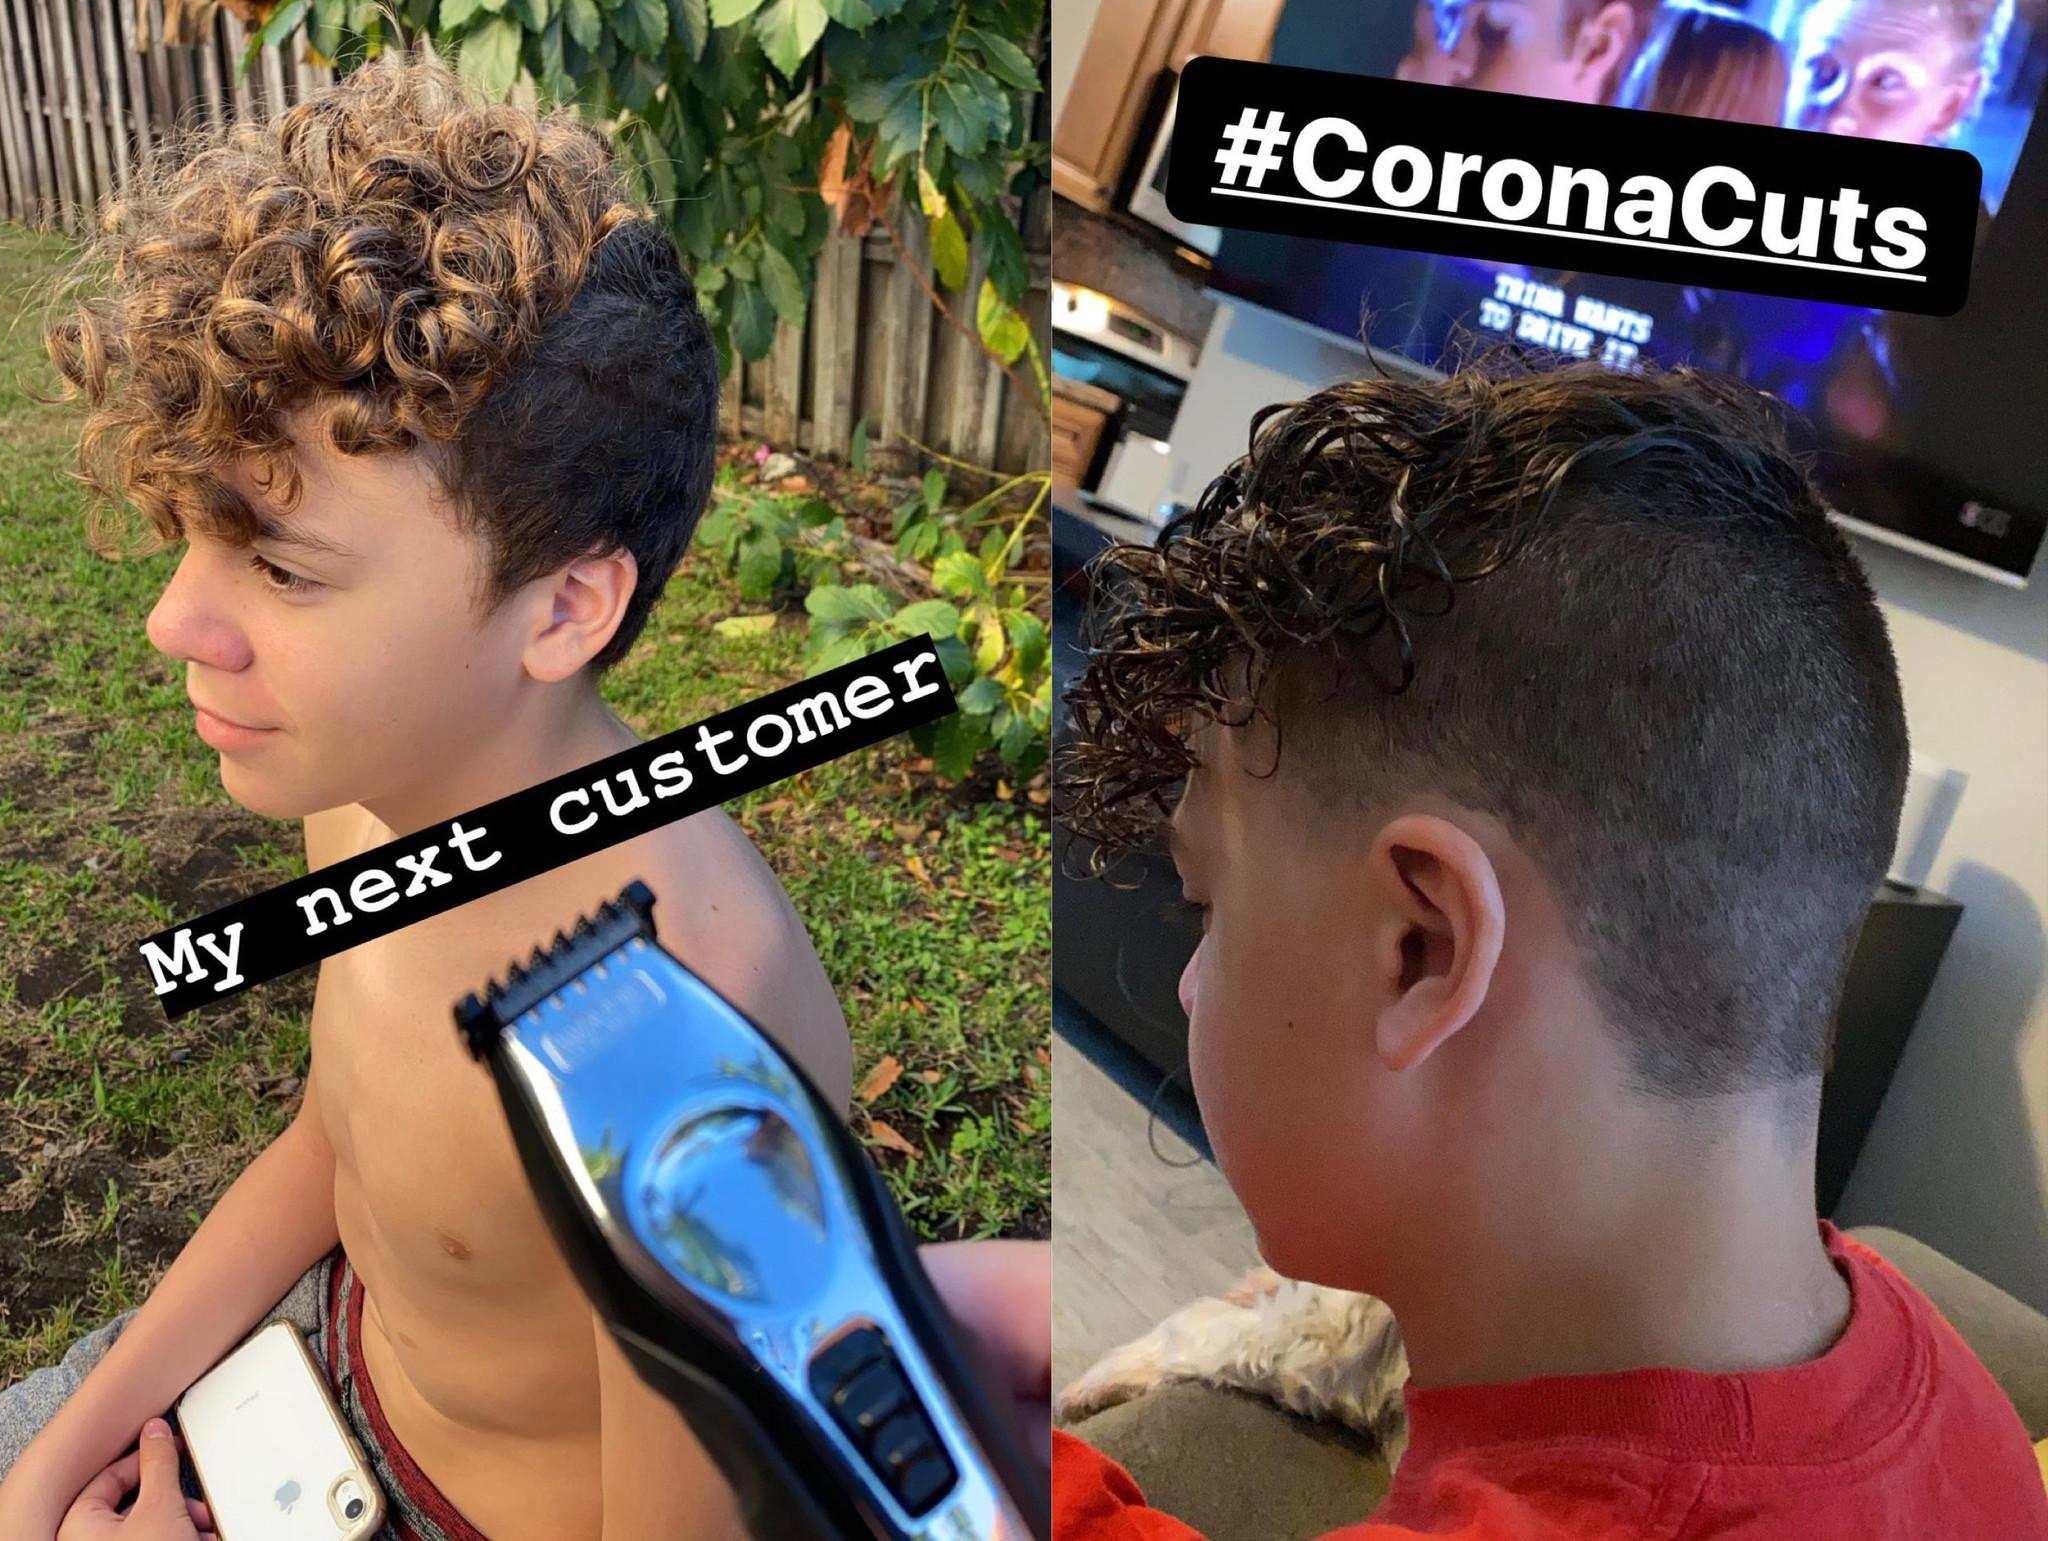 South Floridians Let Hair Nails Go During Coronavirus Crisis South Florida Sun Sentinel